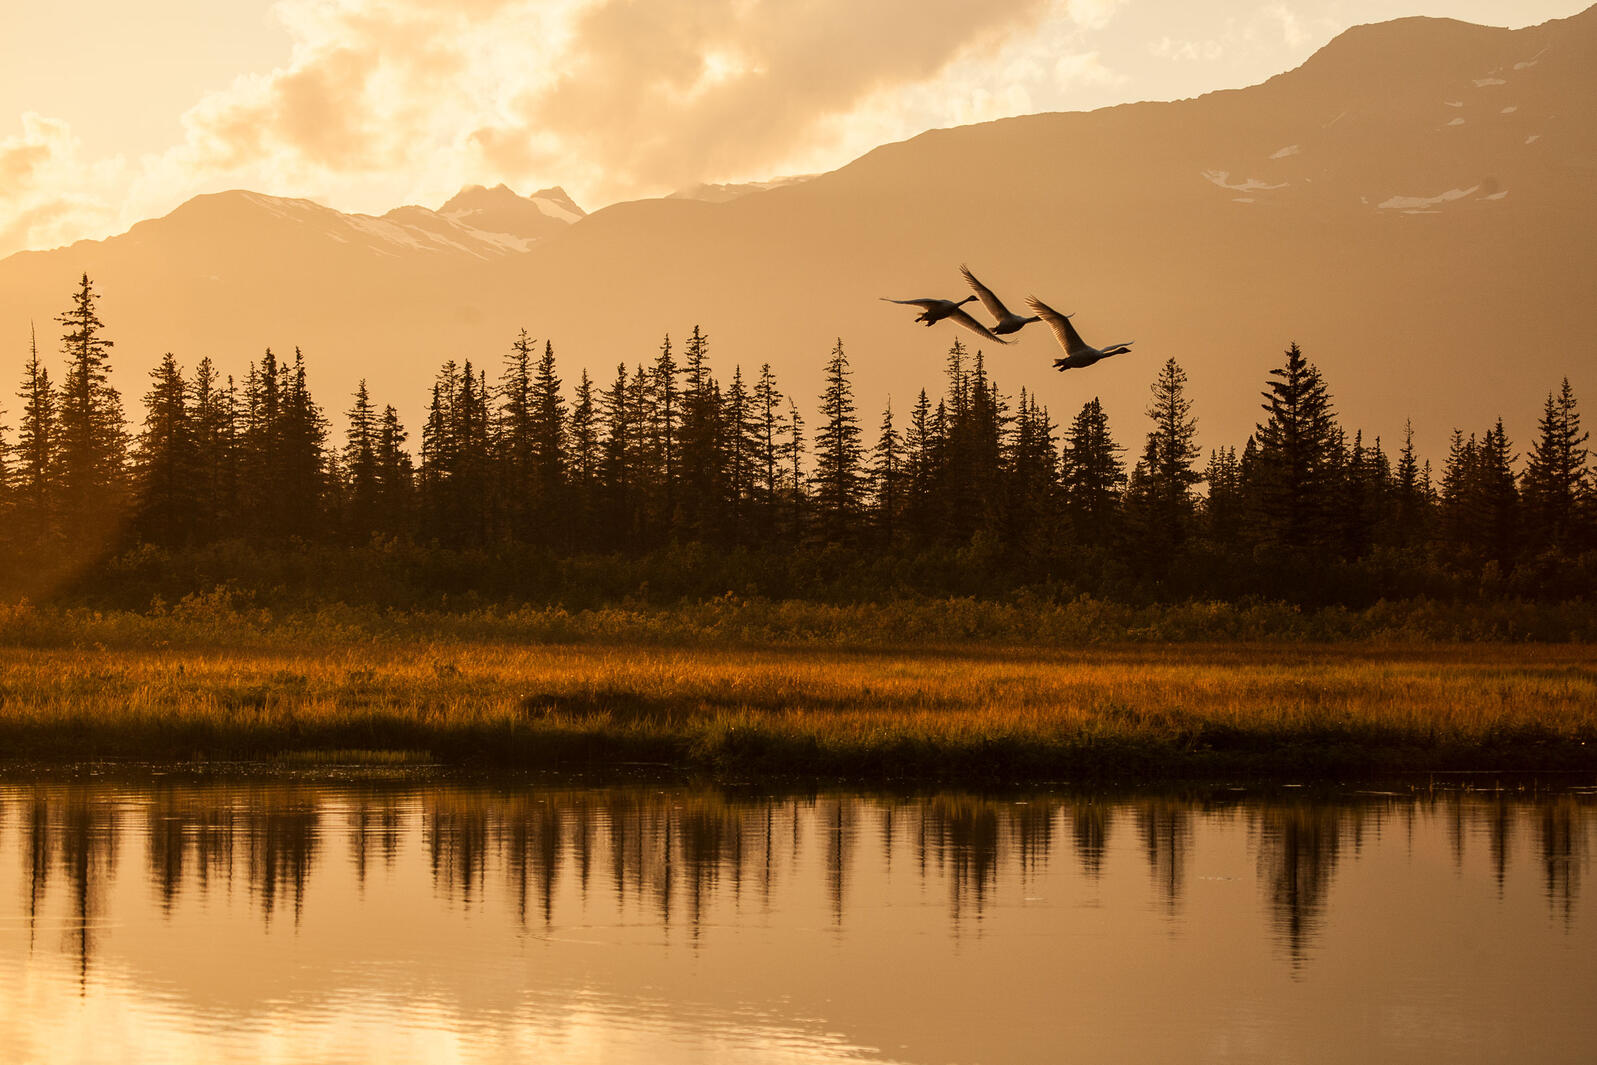 Tundra Swans. Joshua Pelta-Heller/Audubon Photography Awards